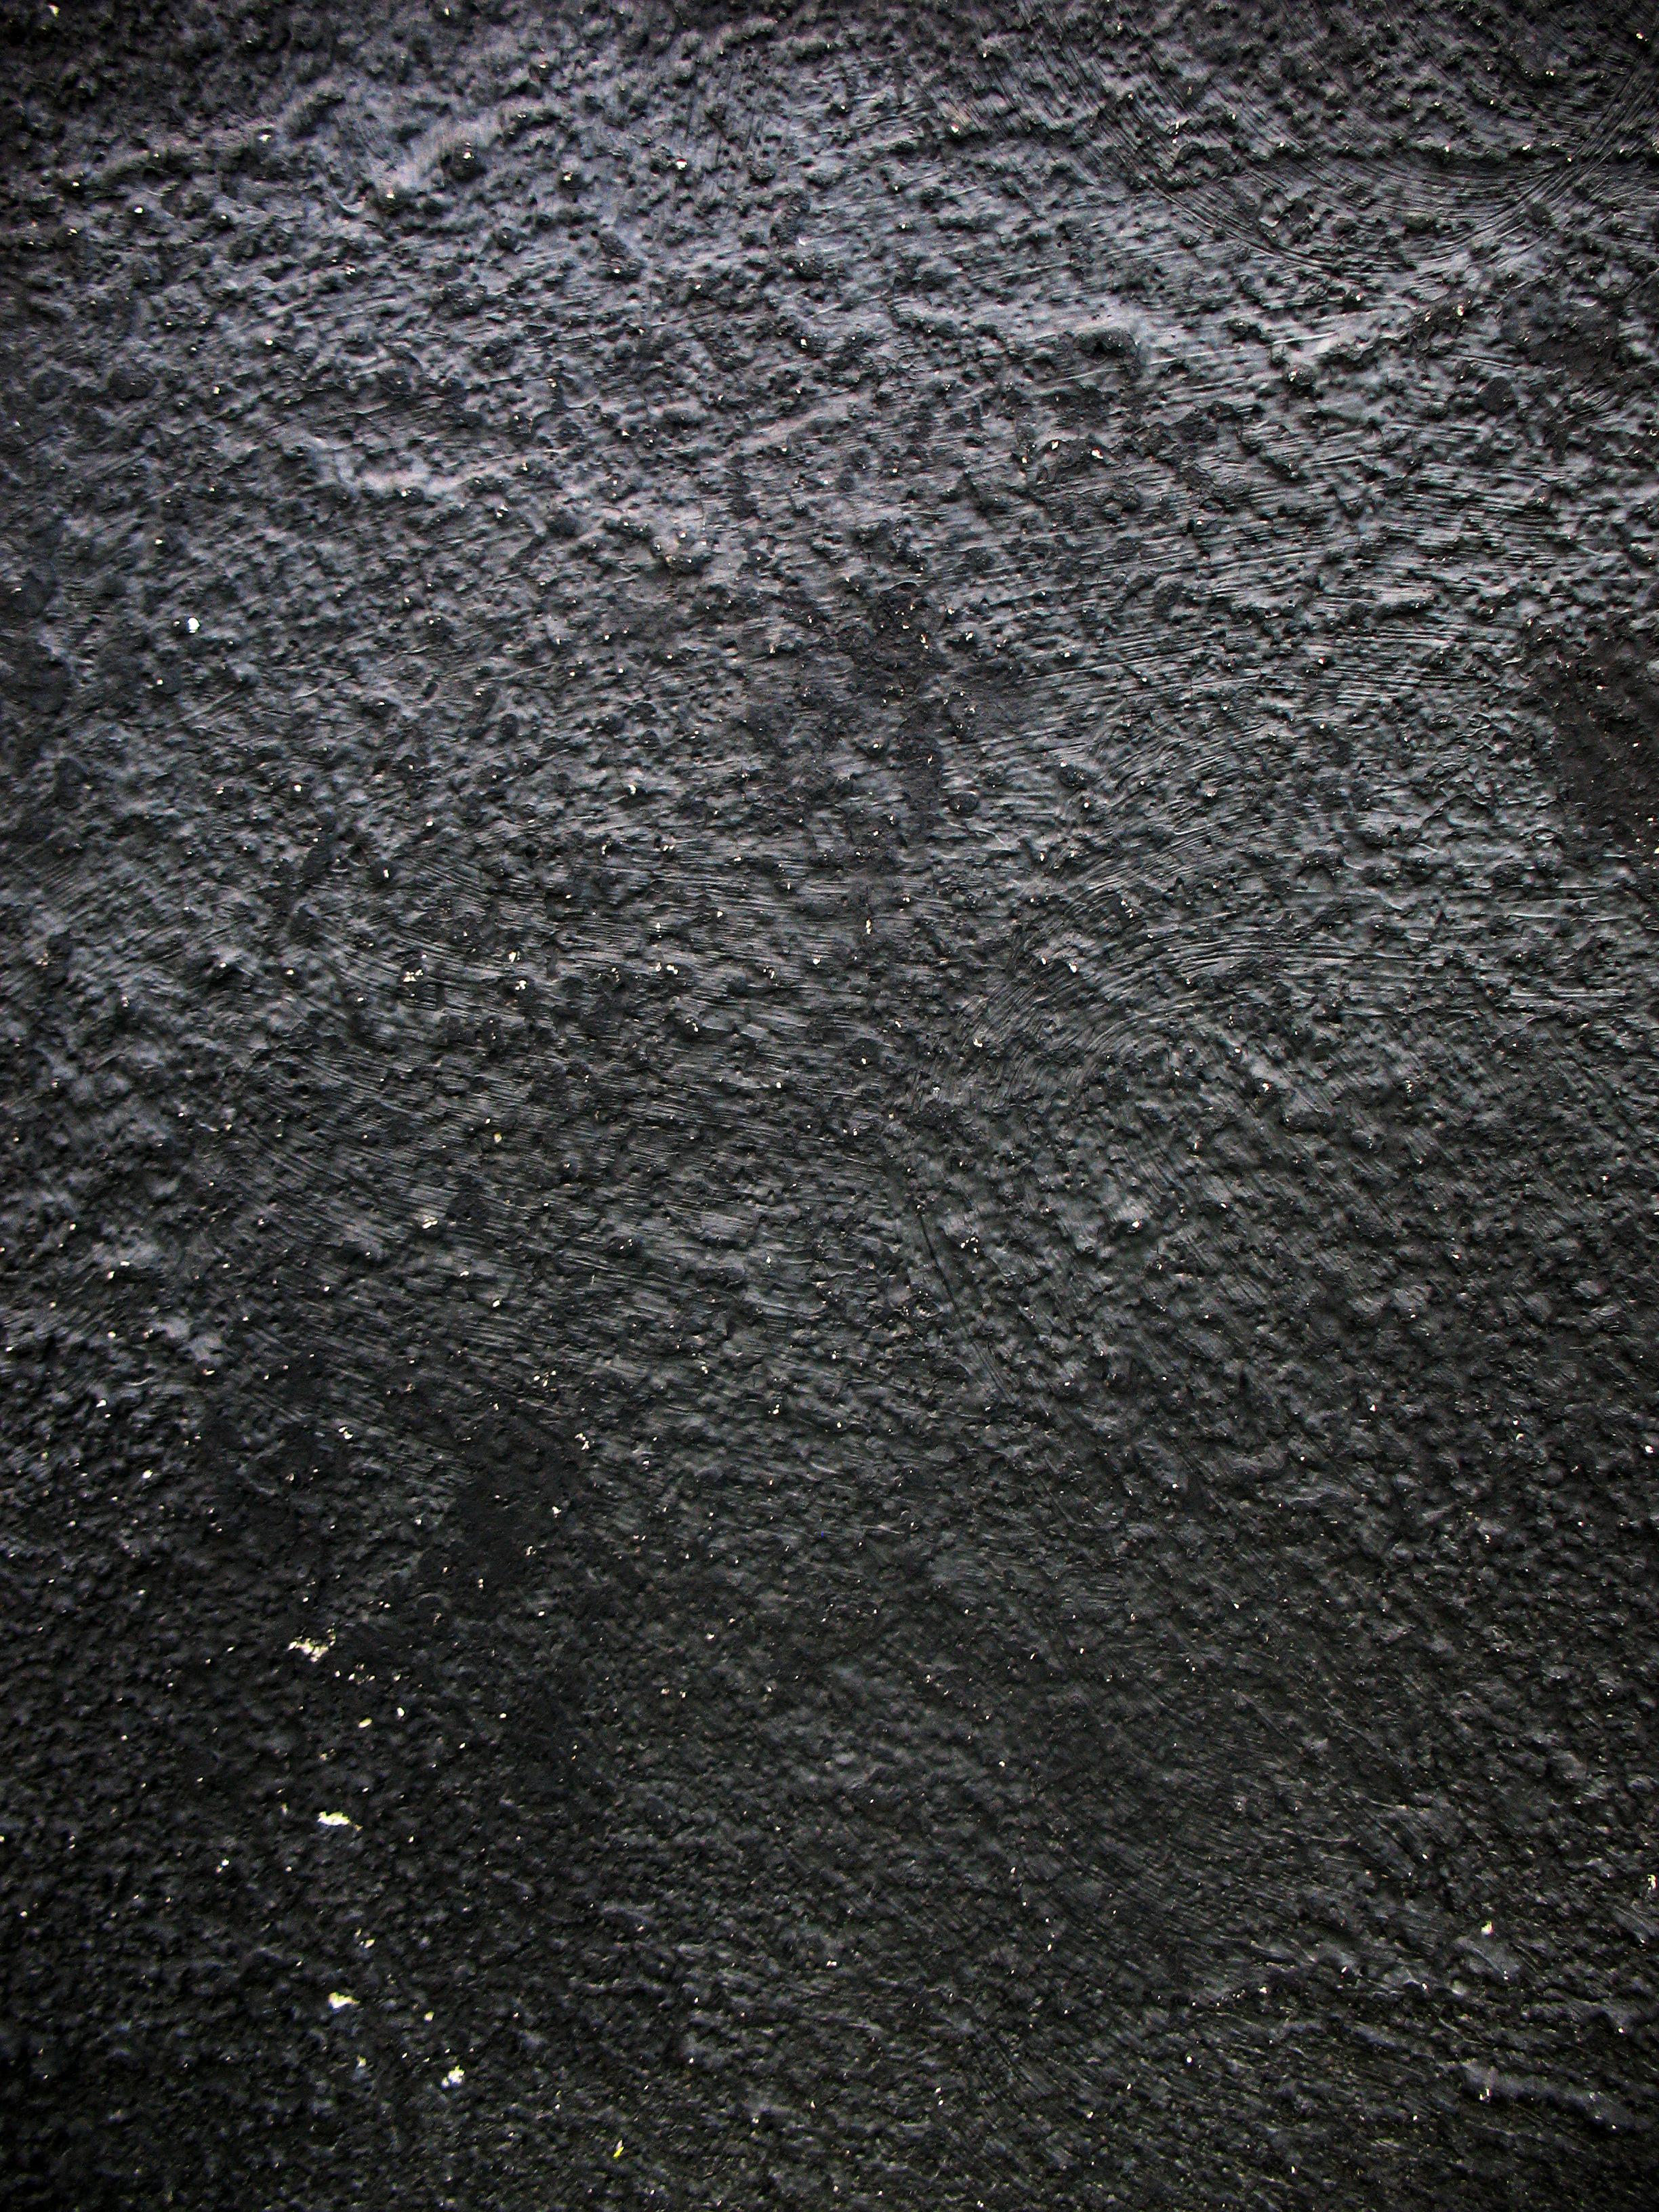 Black Wall Texture, Black, Bumpy, Dark, Freetexturefrida, HQ Photo